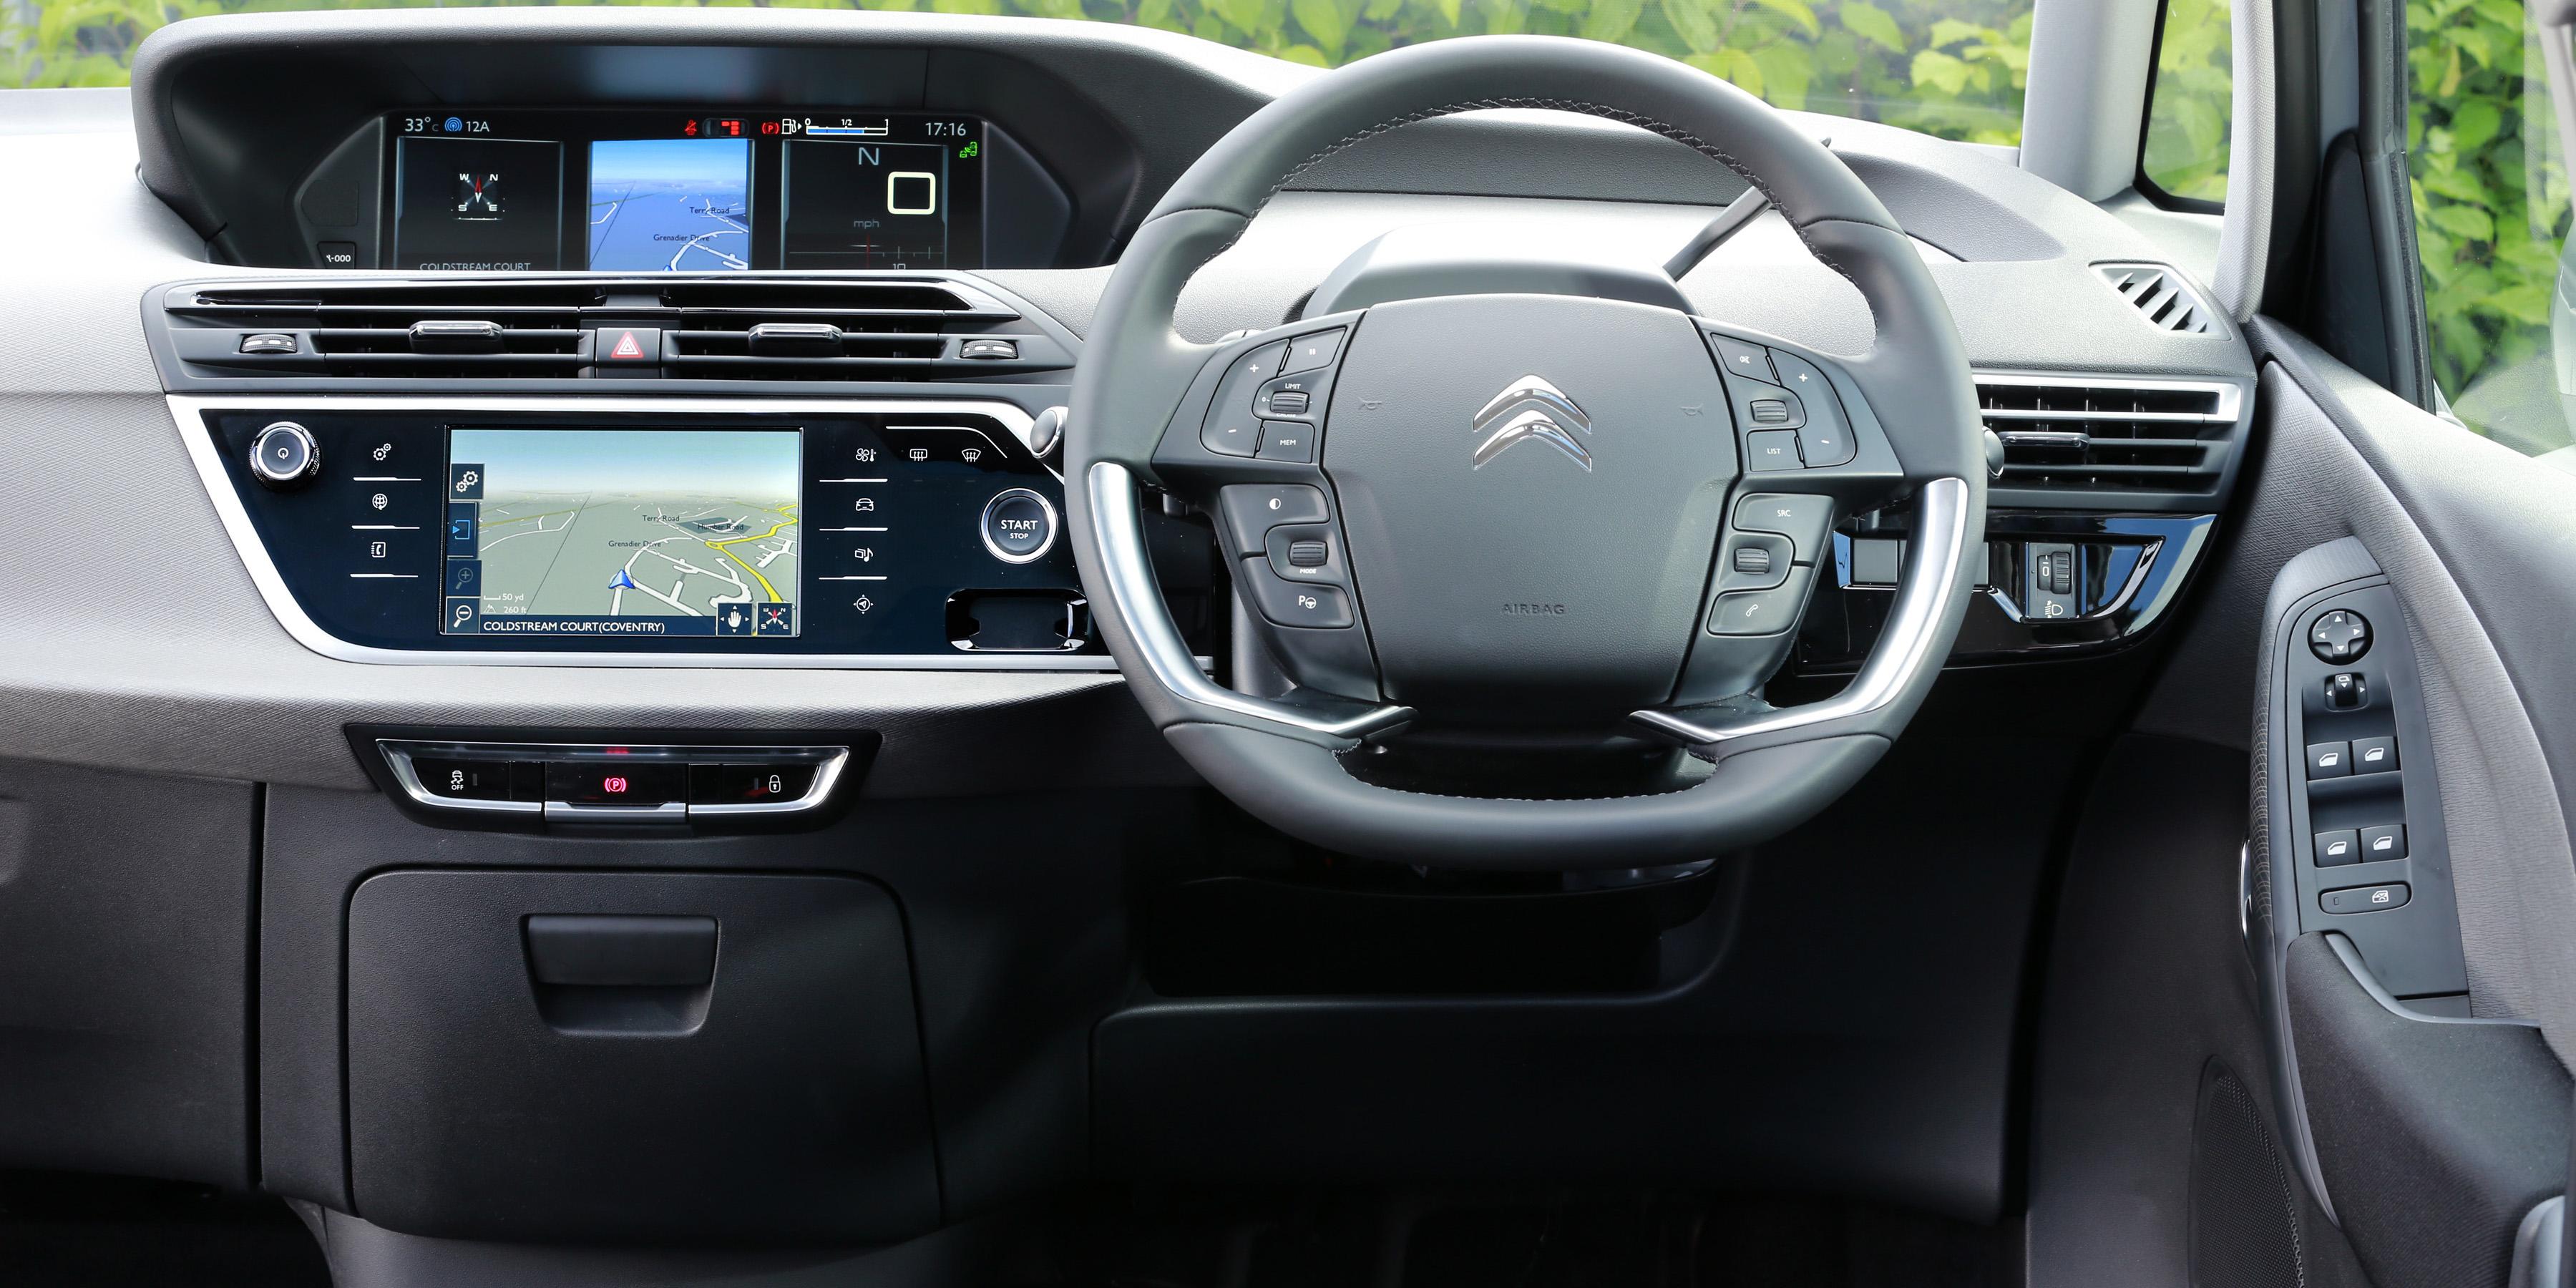 Volvo Of Tucson >> Citroen C4 SpaceTourer Interior & Infotainment | carwow